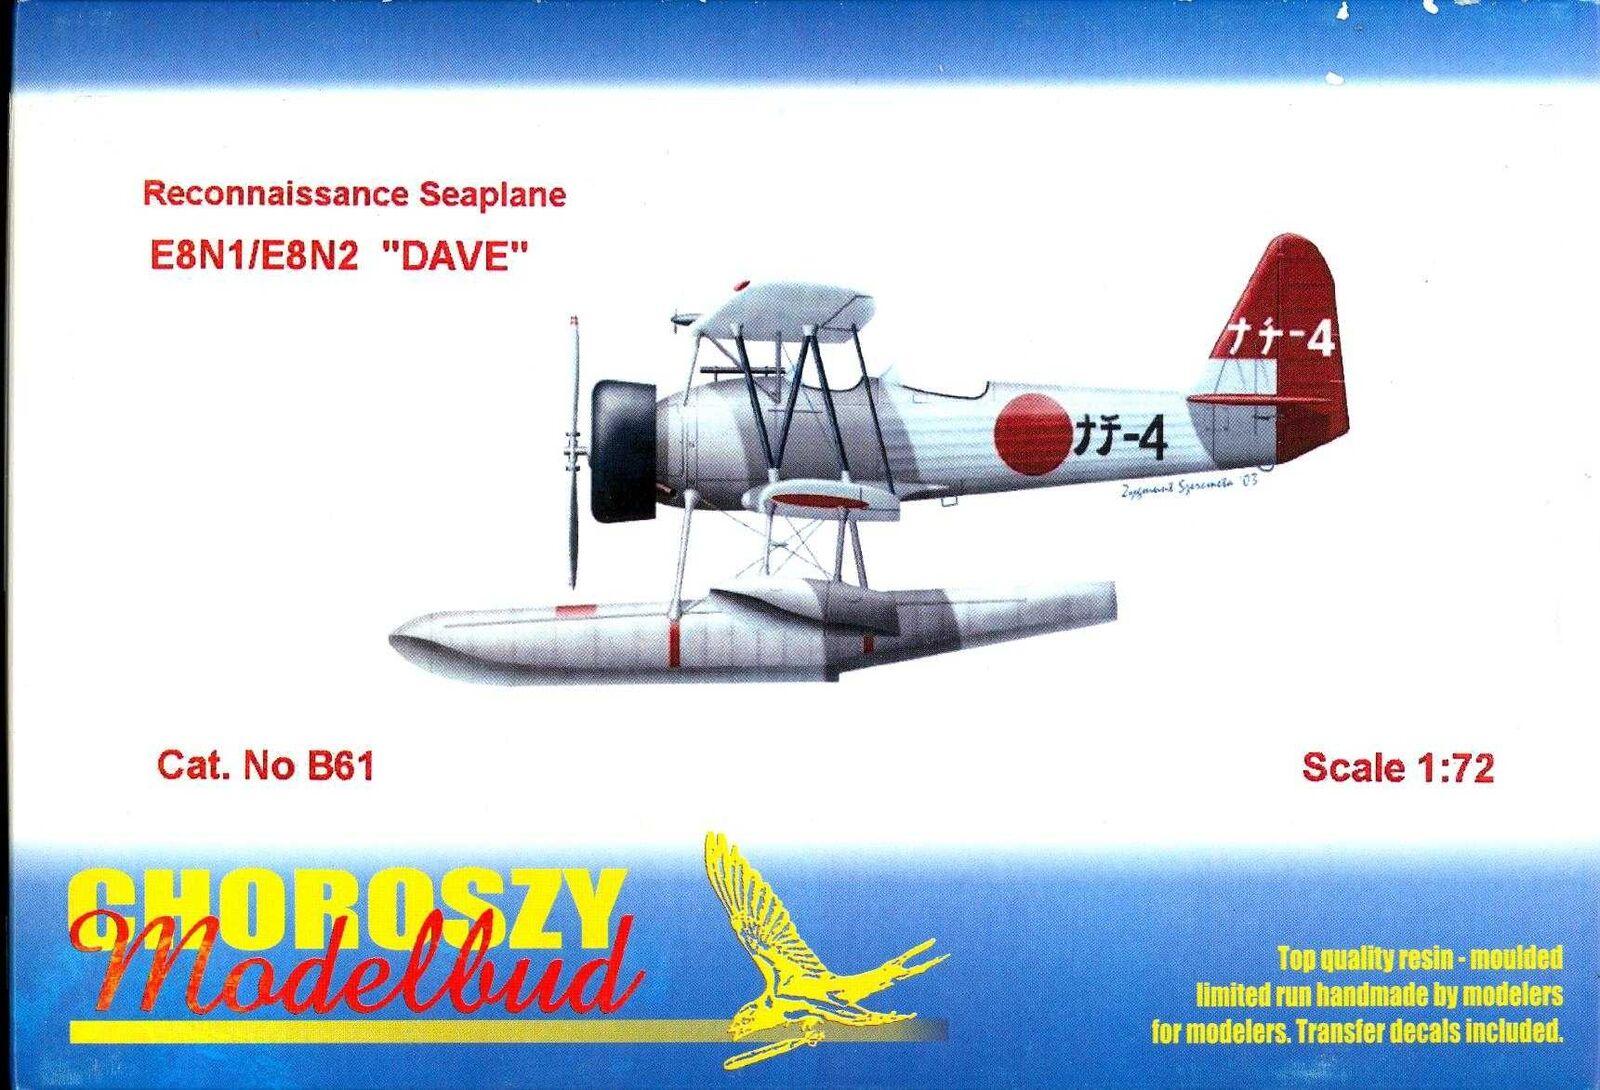 Chgoldszy Models 1 72 NAKAJIMA E8N1 DAVE Japanese WWII Seaplane